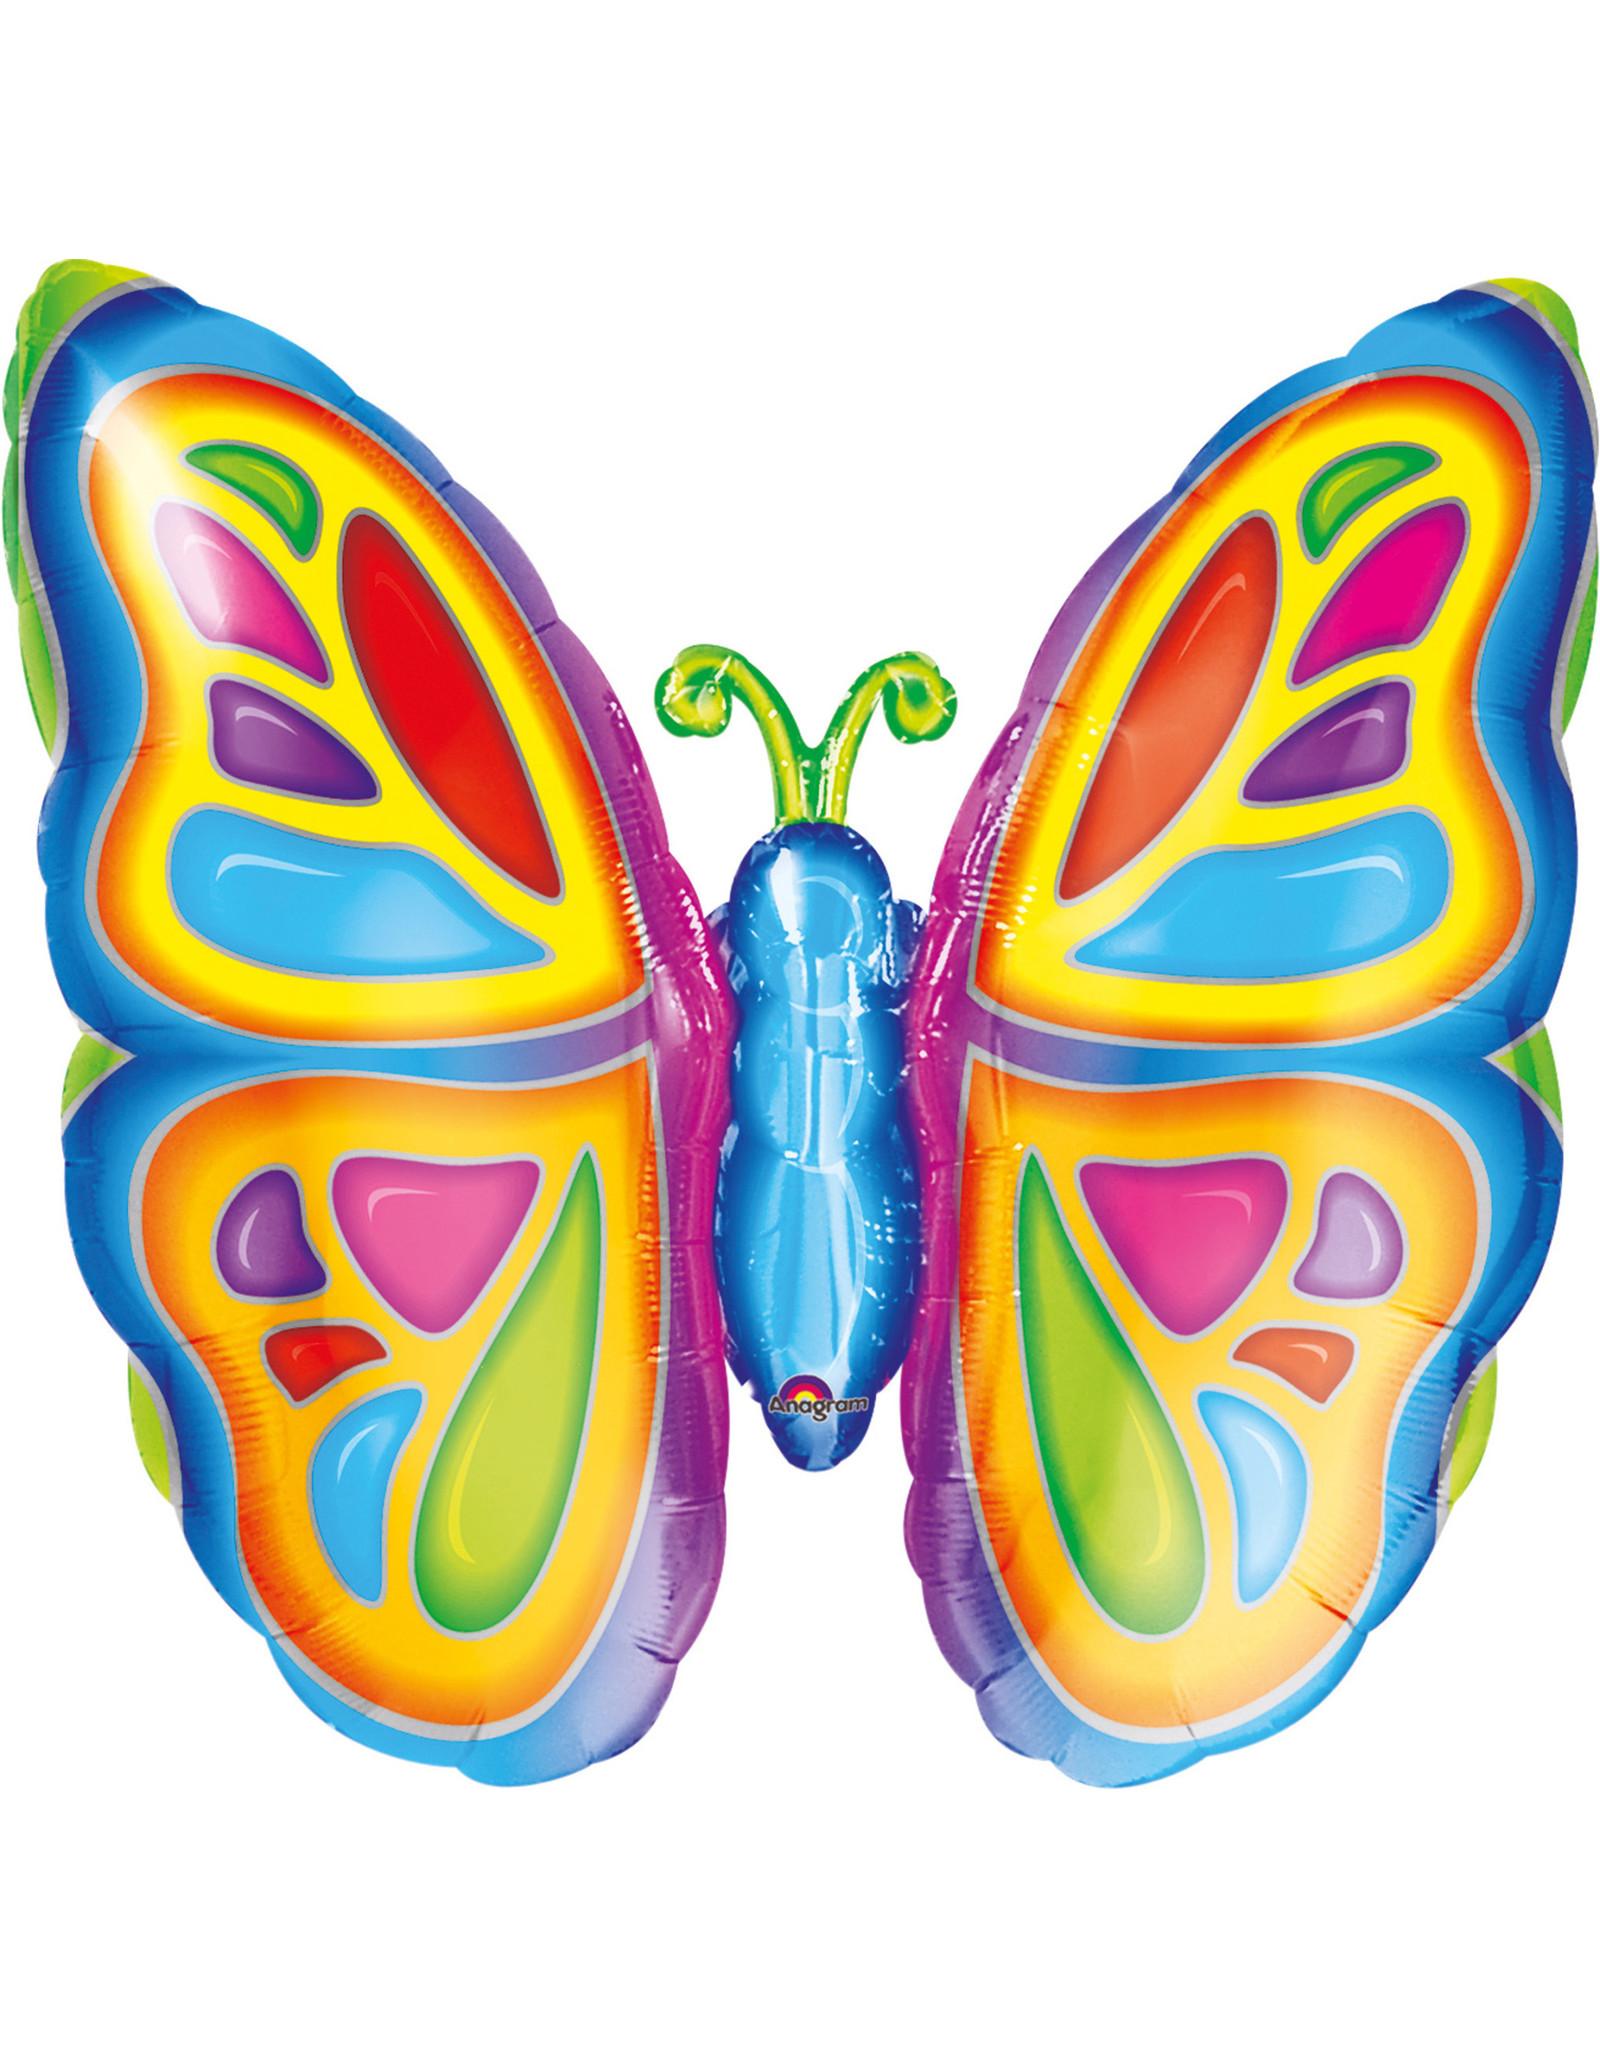 Amscan folieballon supershape vlinder 63 x 63 cm